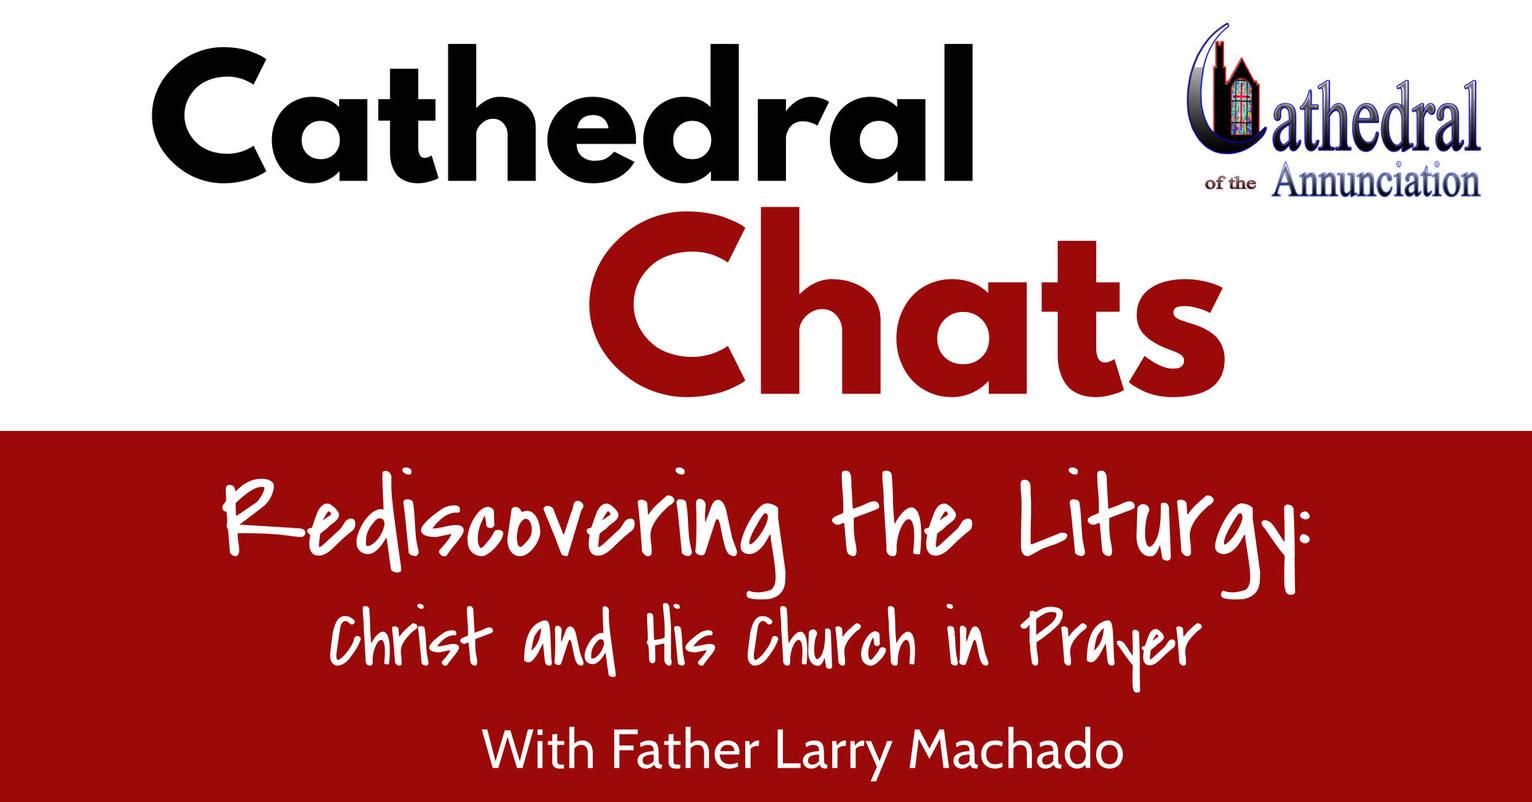 Cathedral Chats Yt Thumbnail  June 2021